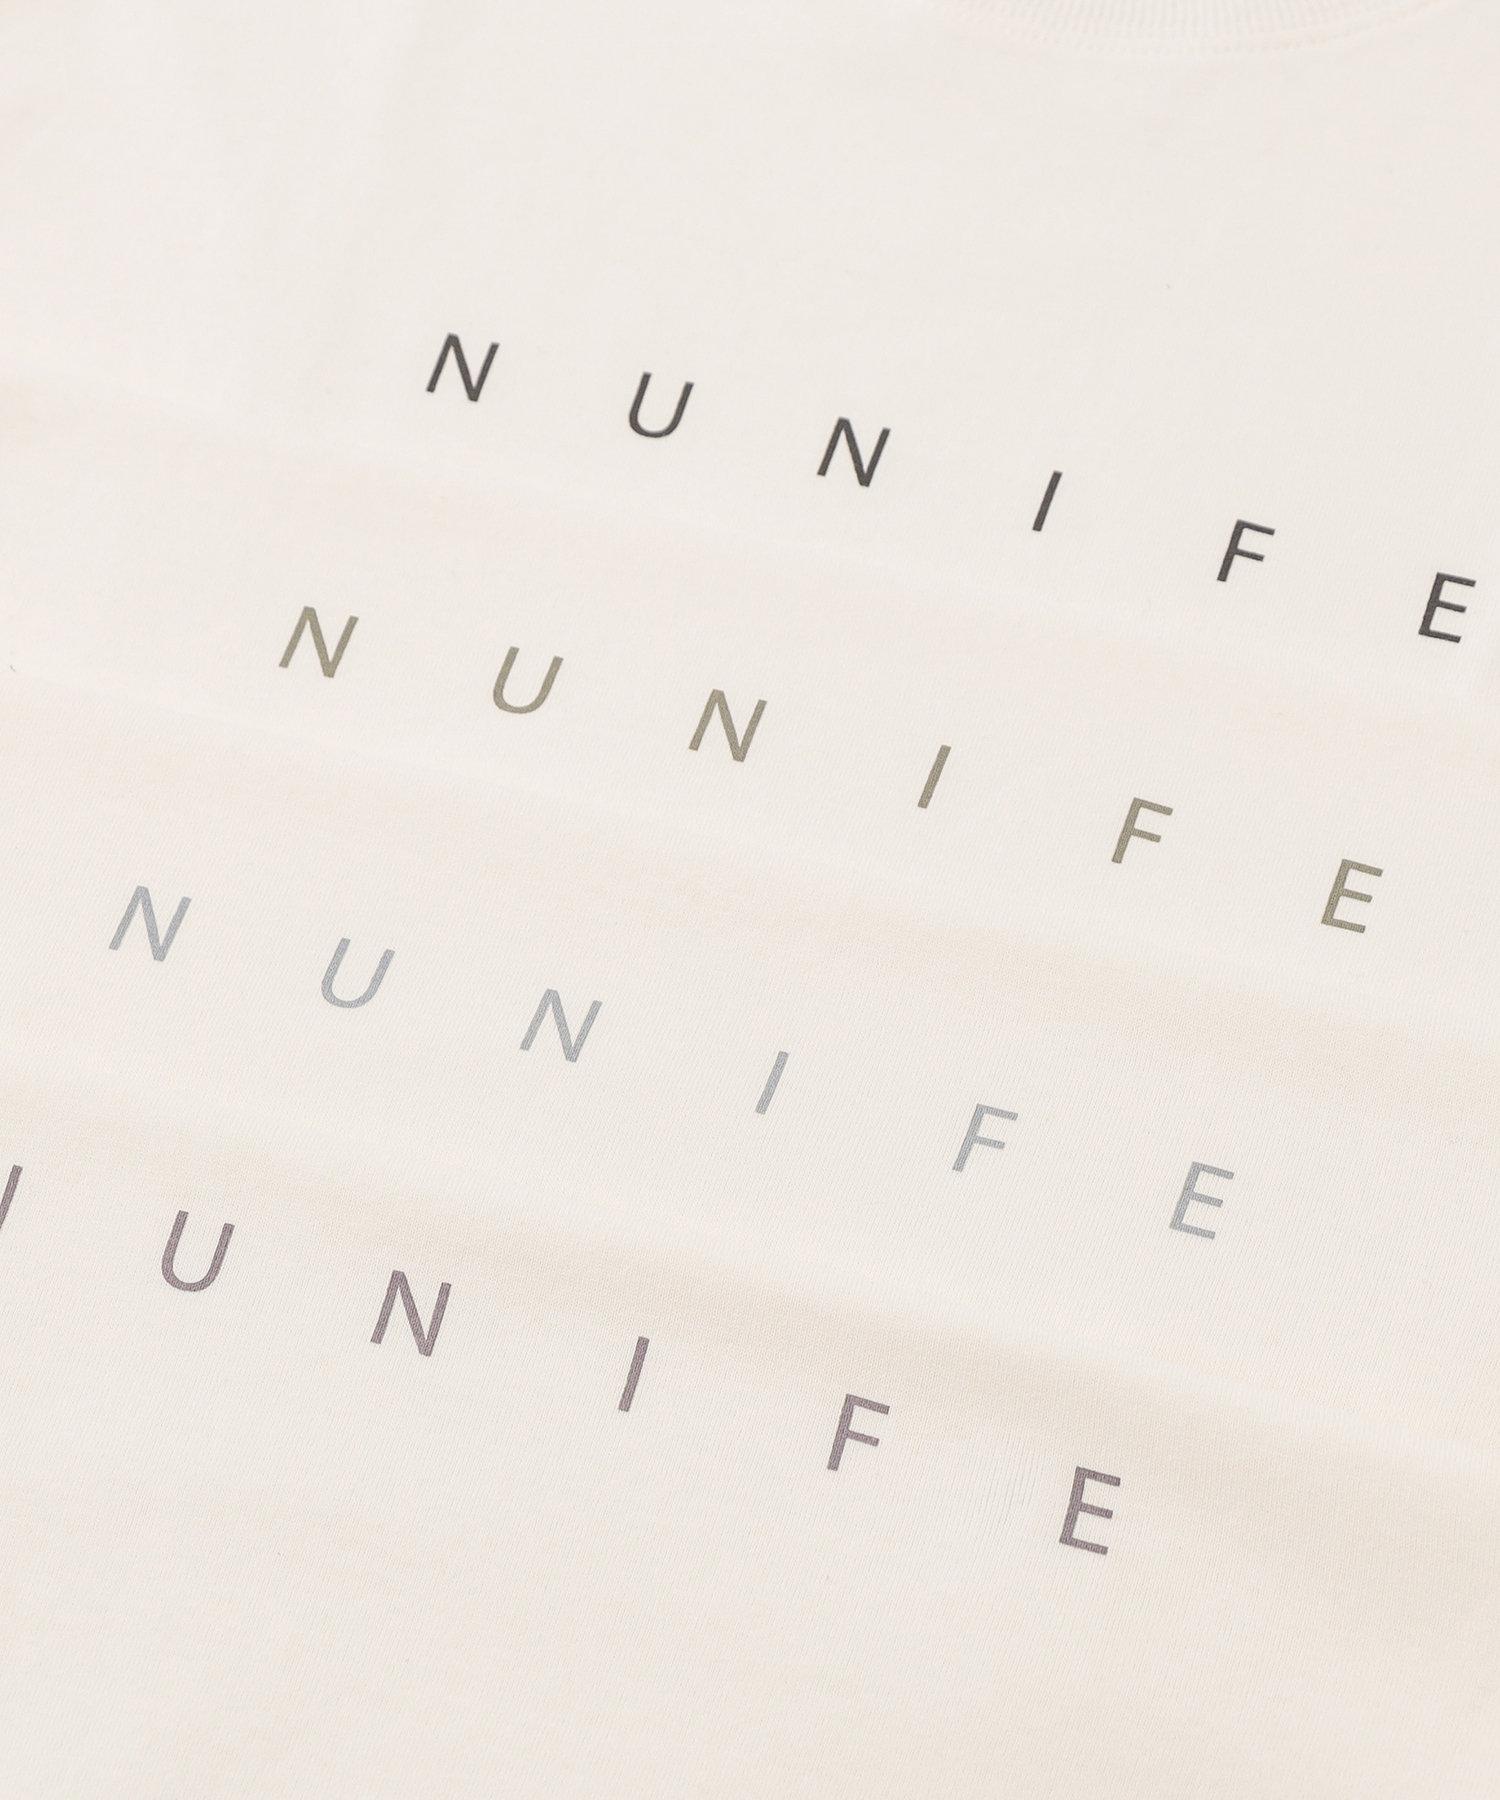 NICE CLAUP OUTLET(ナイスクラップ アウトレット) 【NUNIFE】NUNIFE ロゴロンT